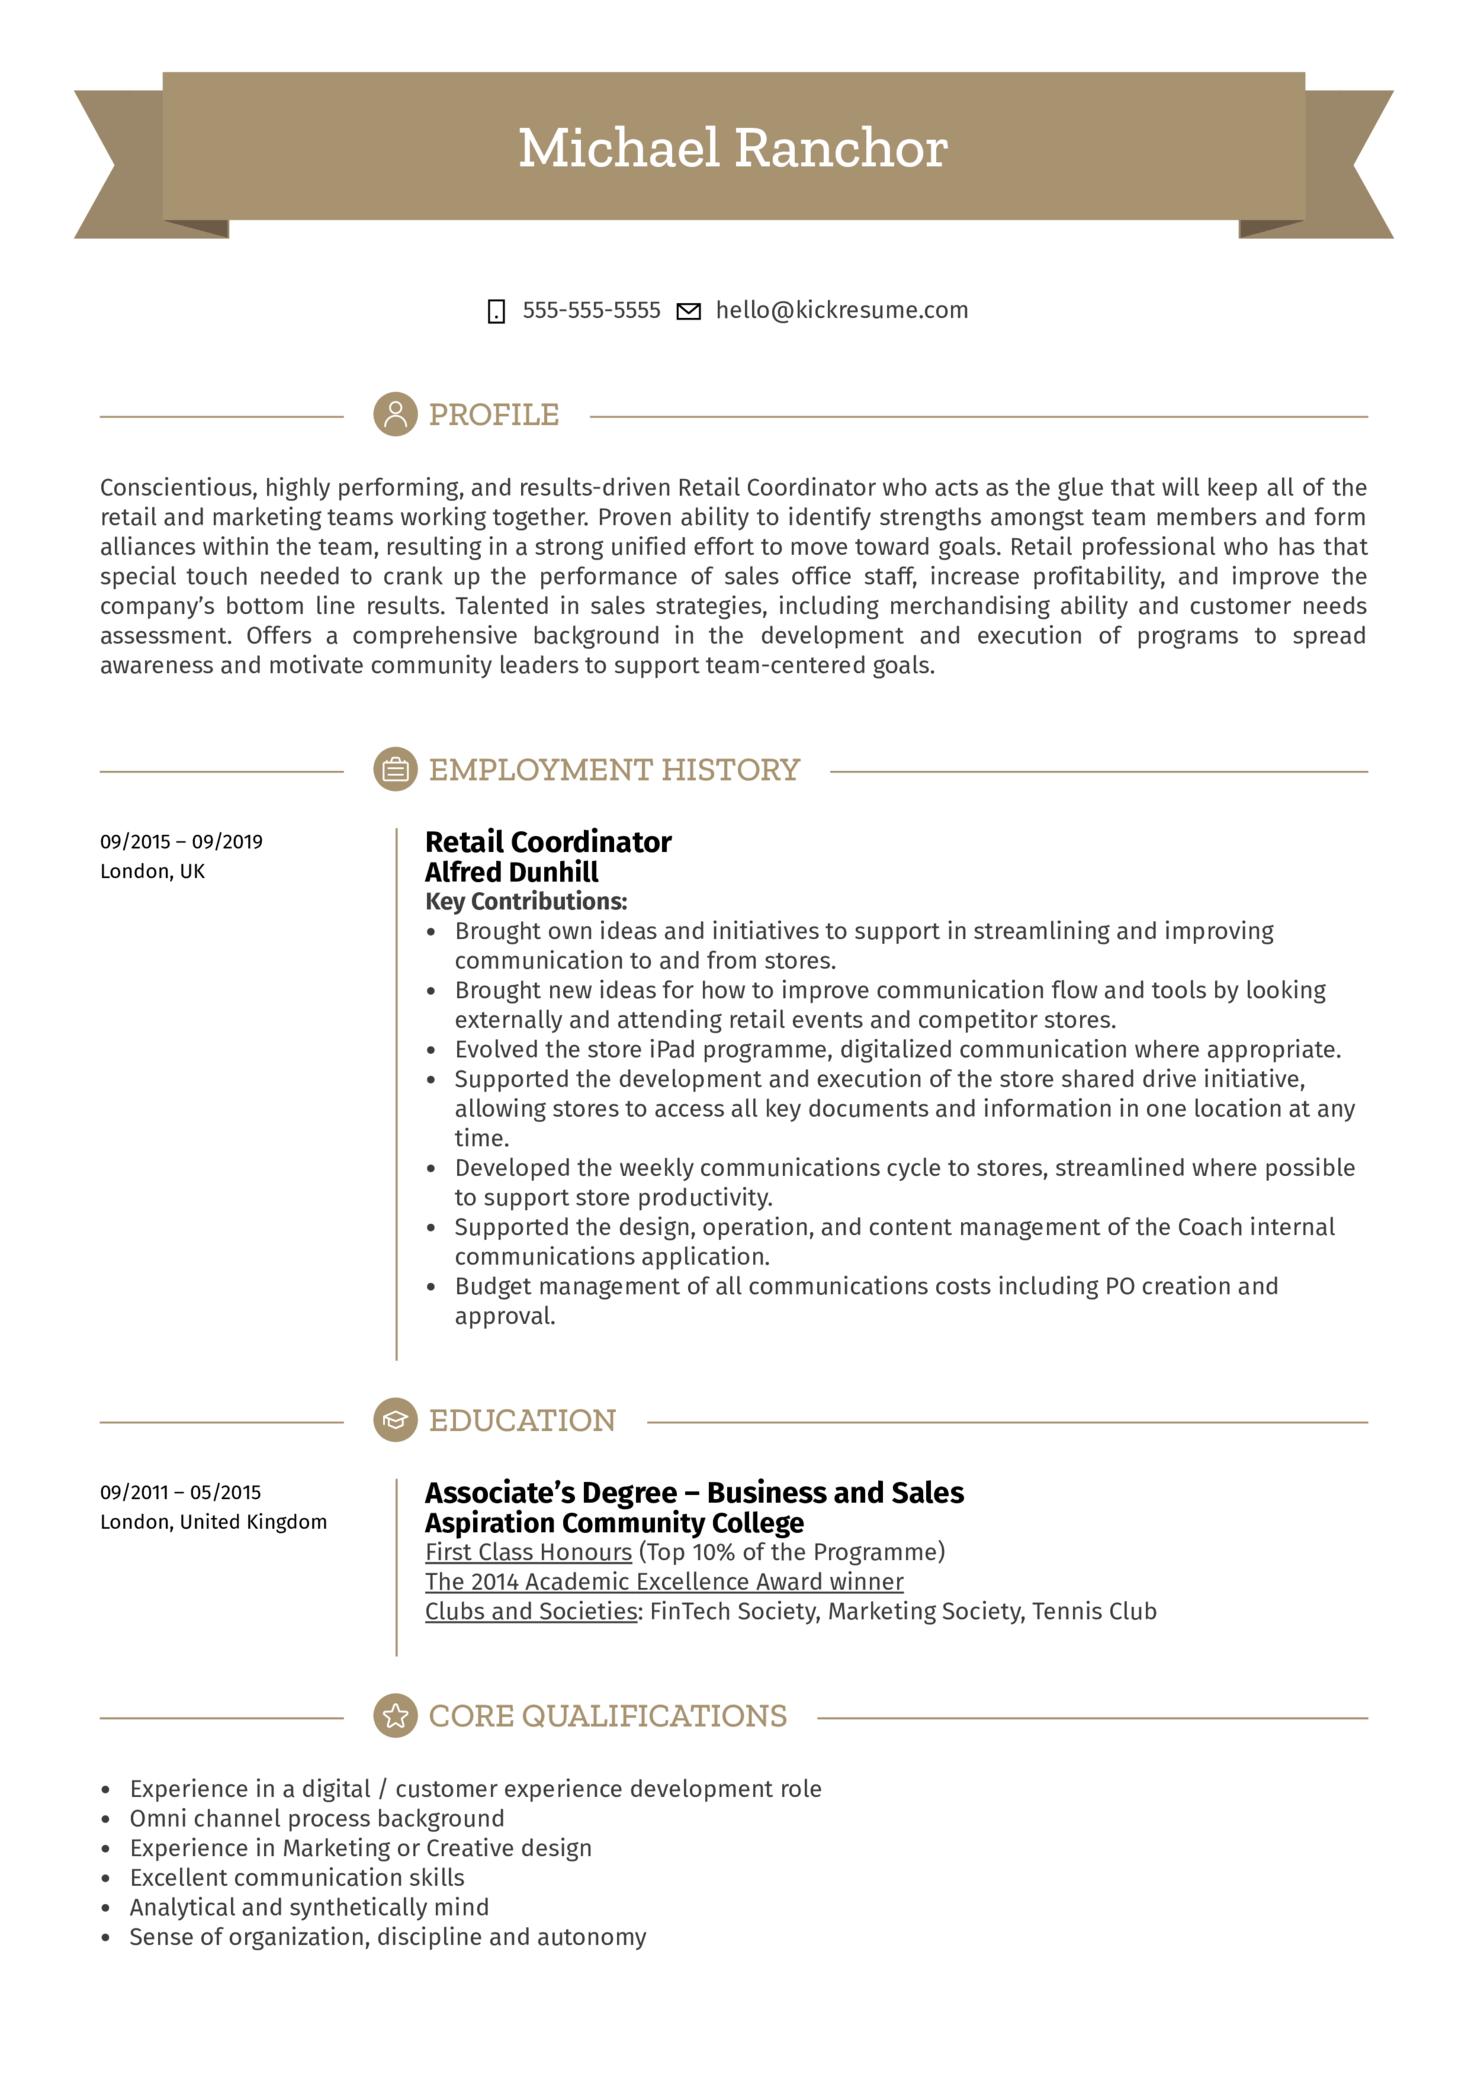 retail resume samples  professional retail resume